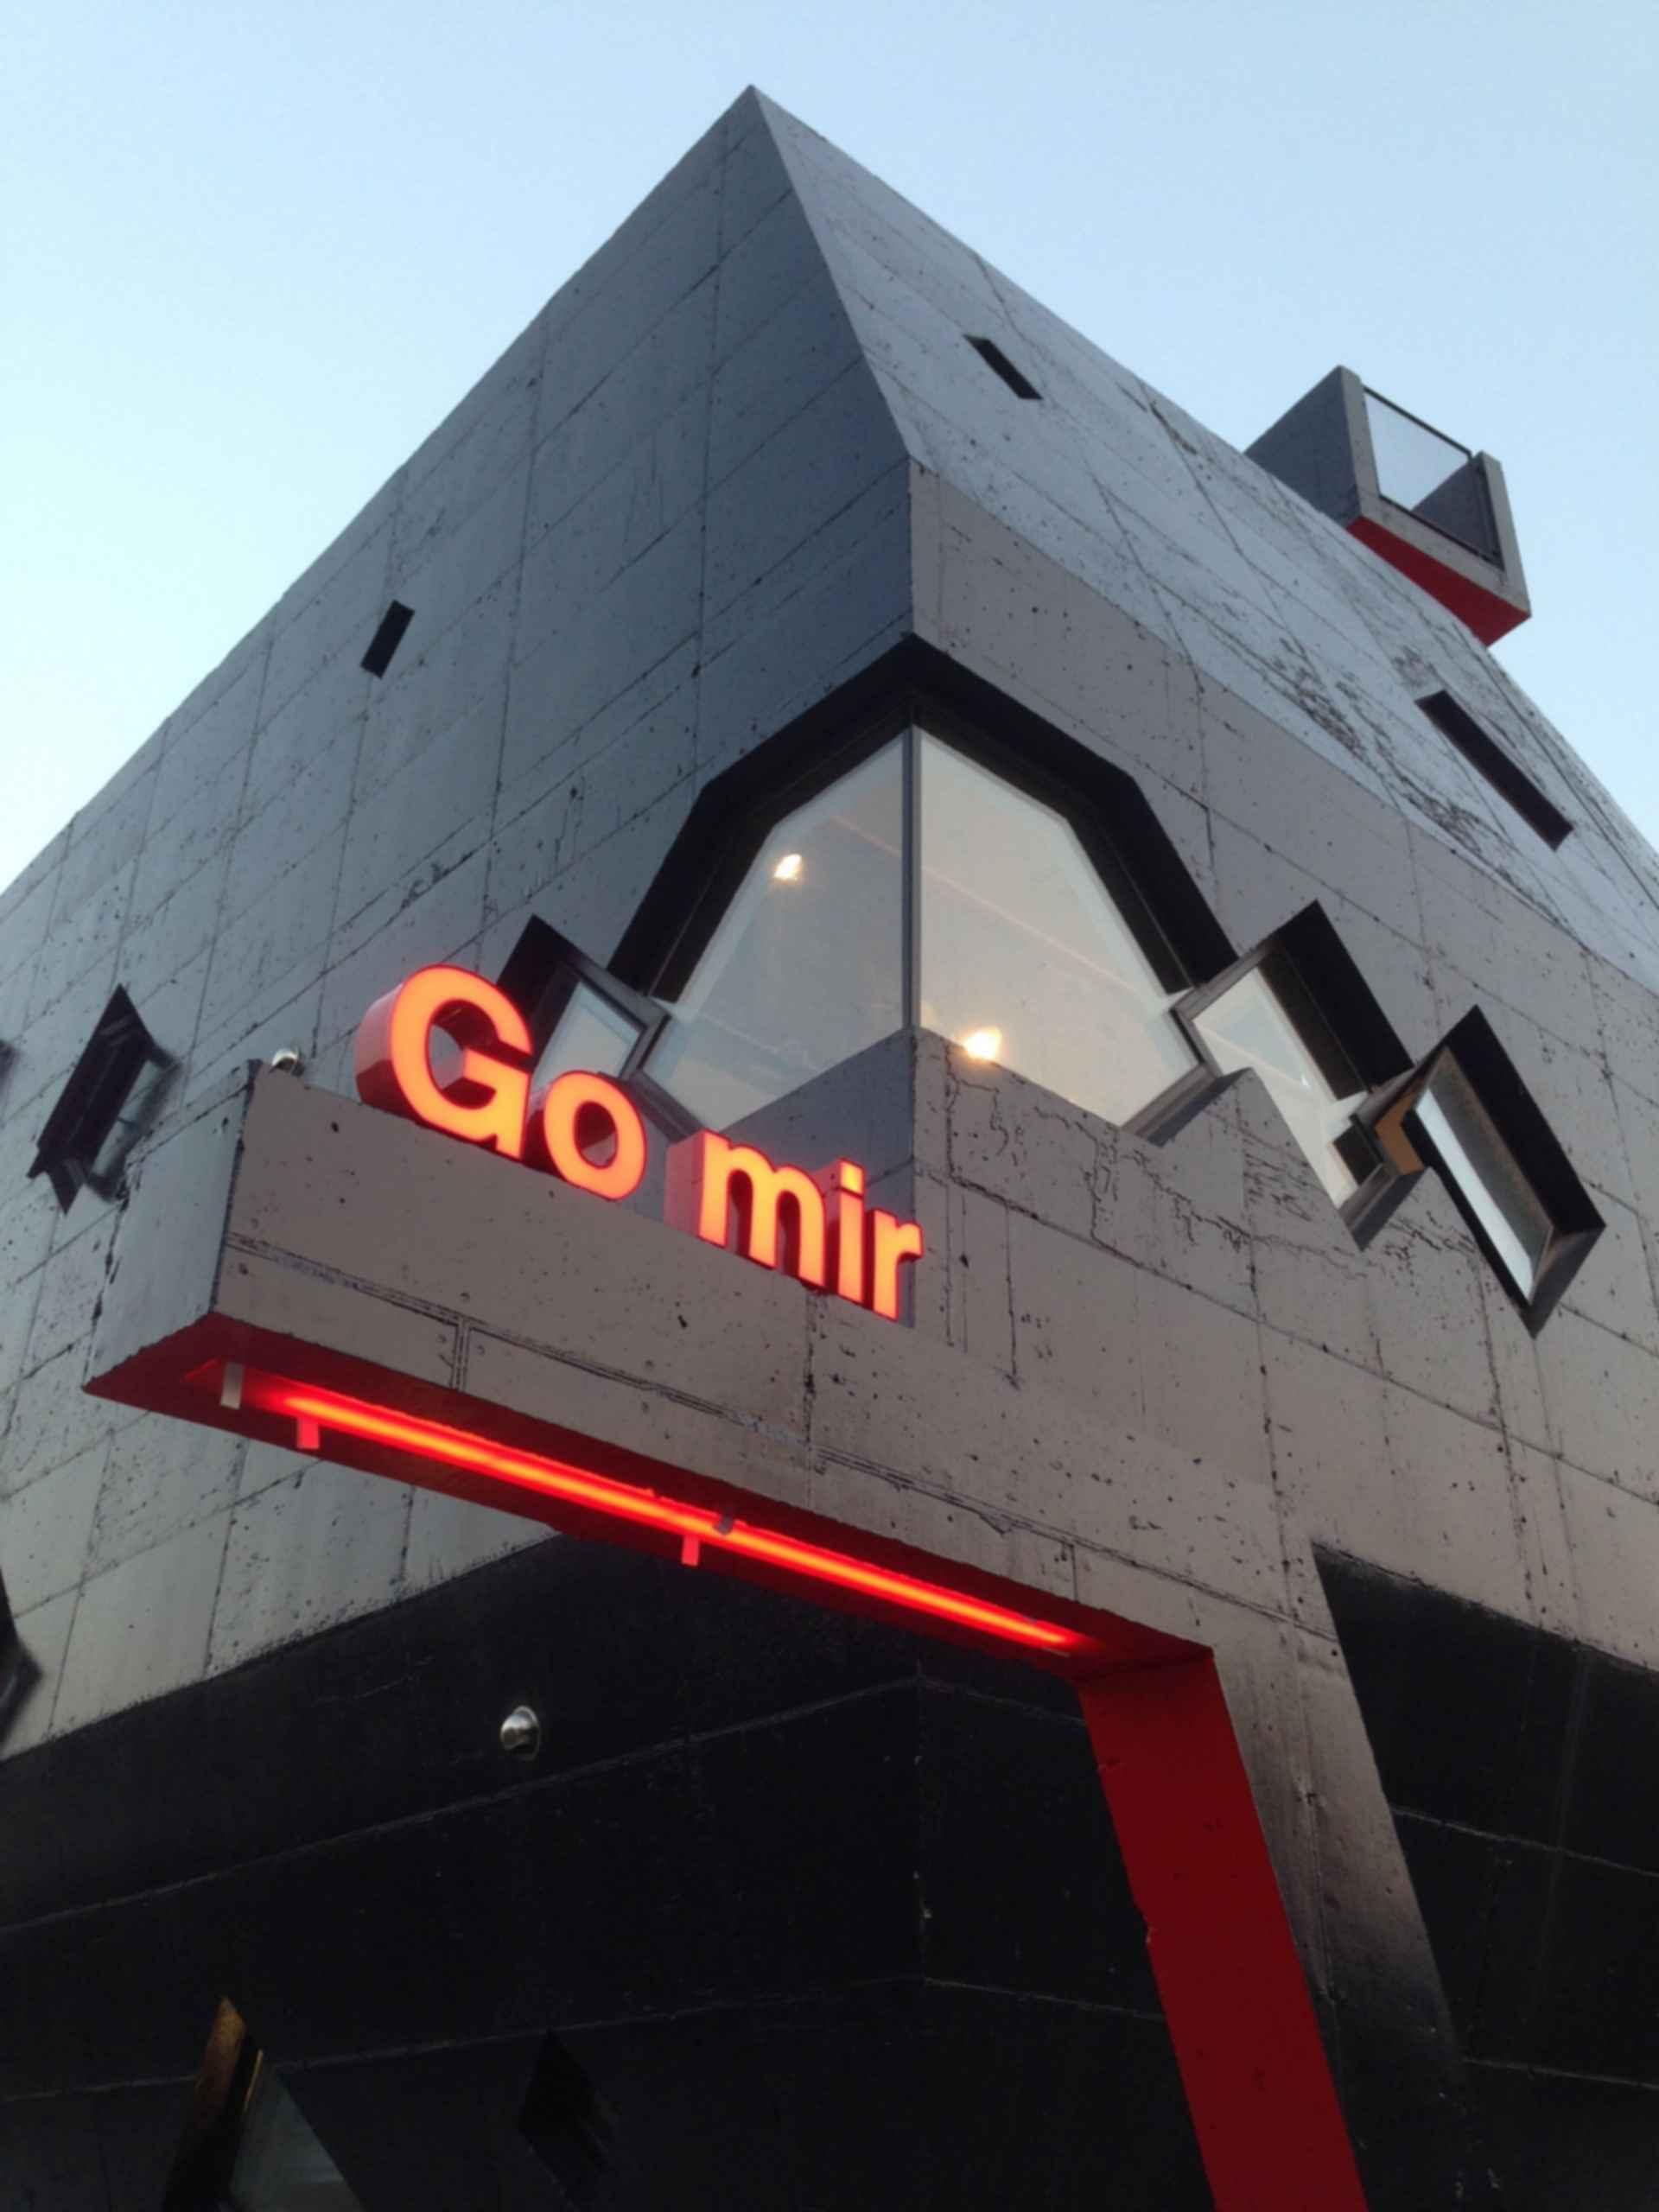 Go.mir Guest House - Exterior